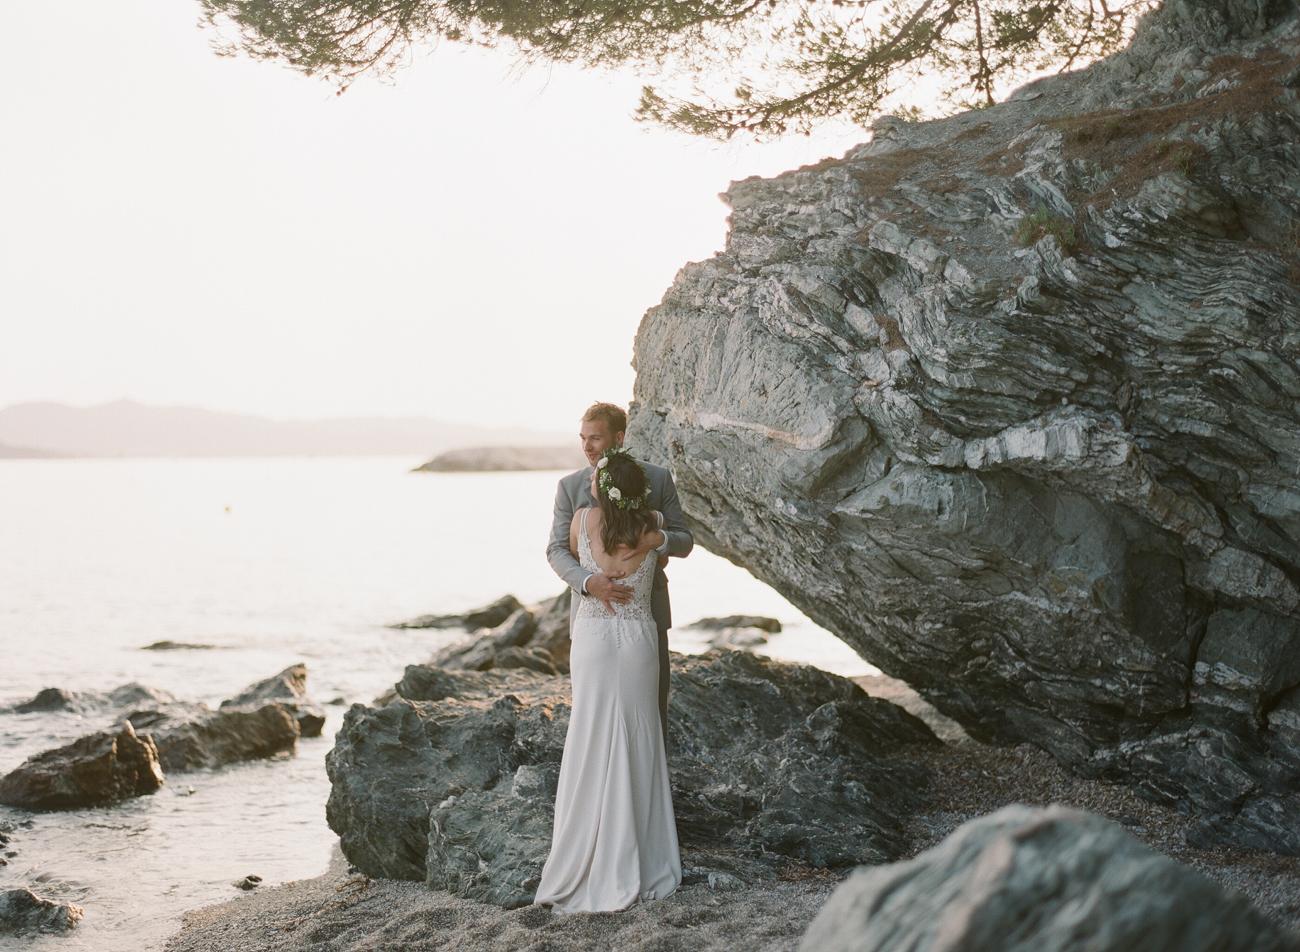 residence-cap-brun-toulon-mariage-photographe-18.jpg